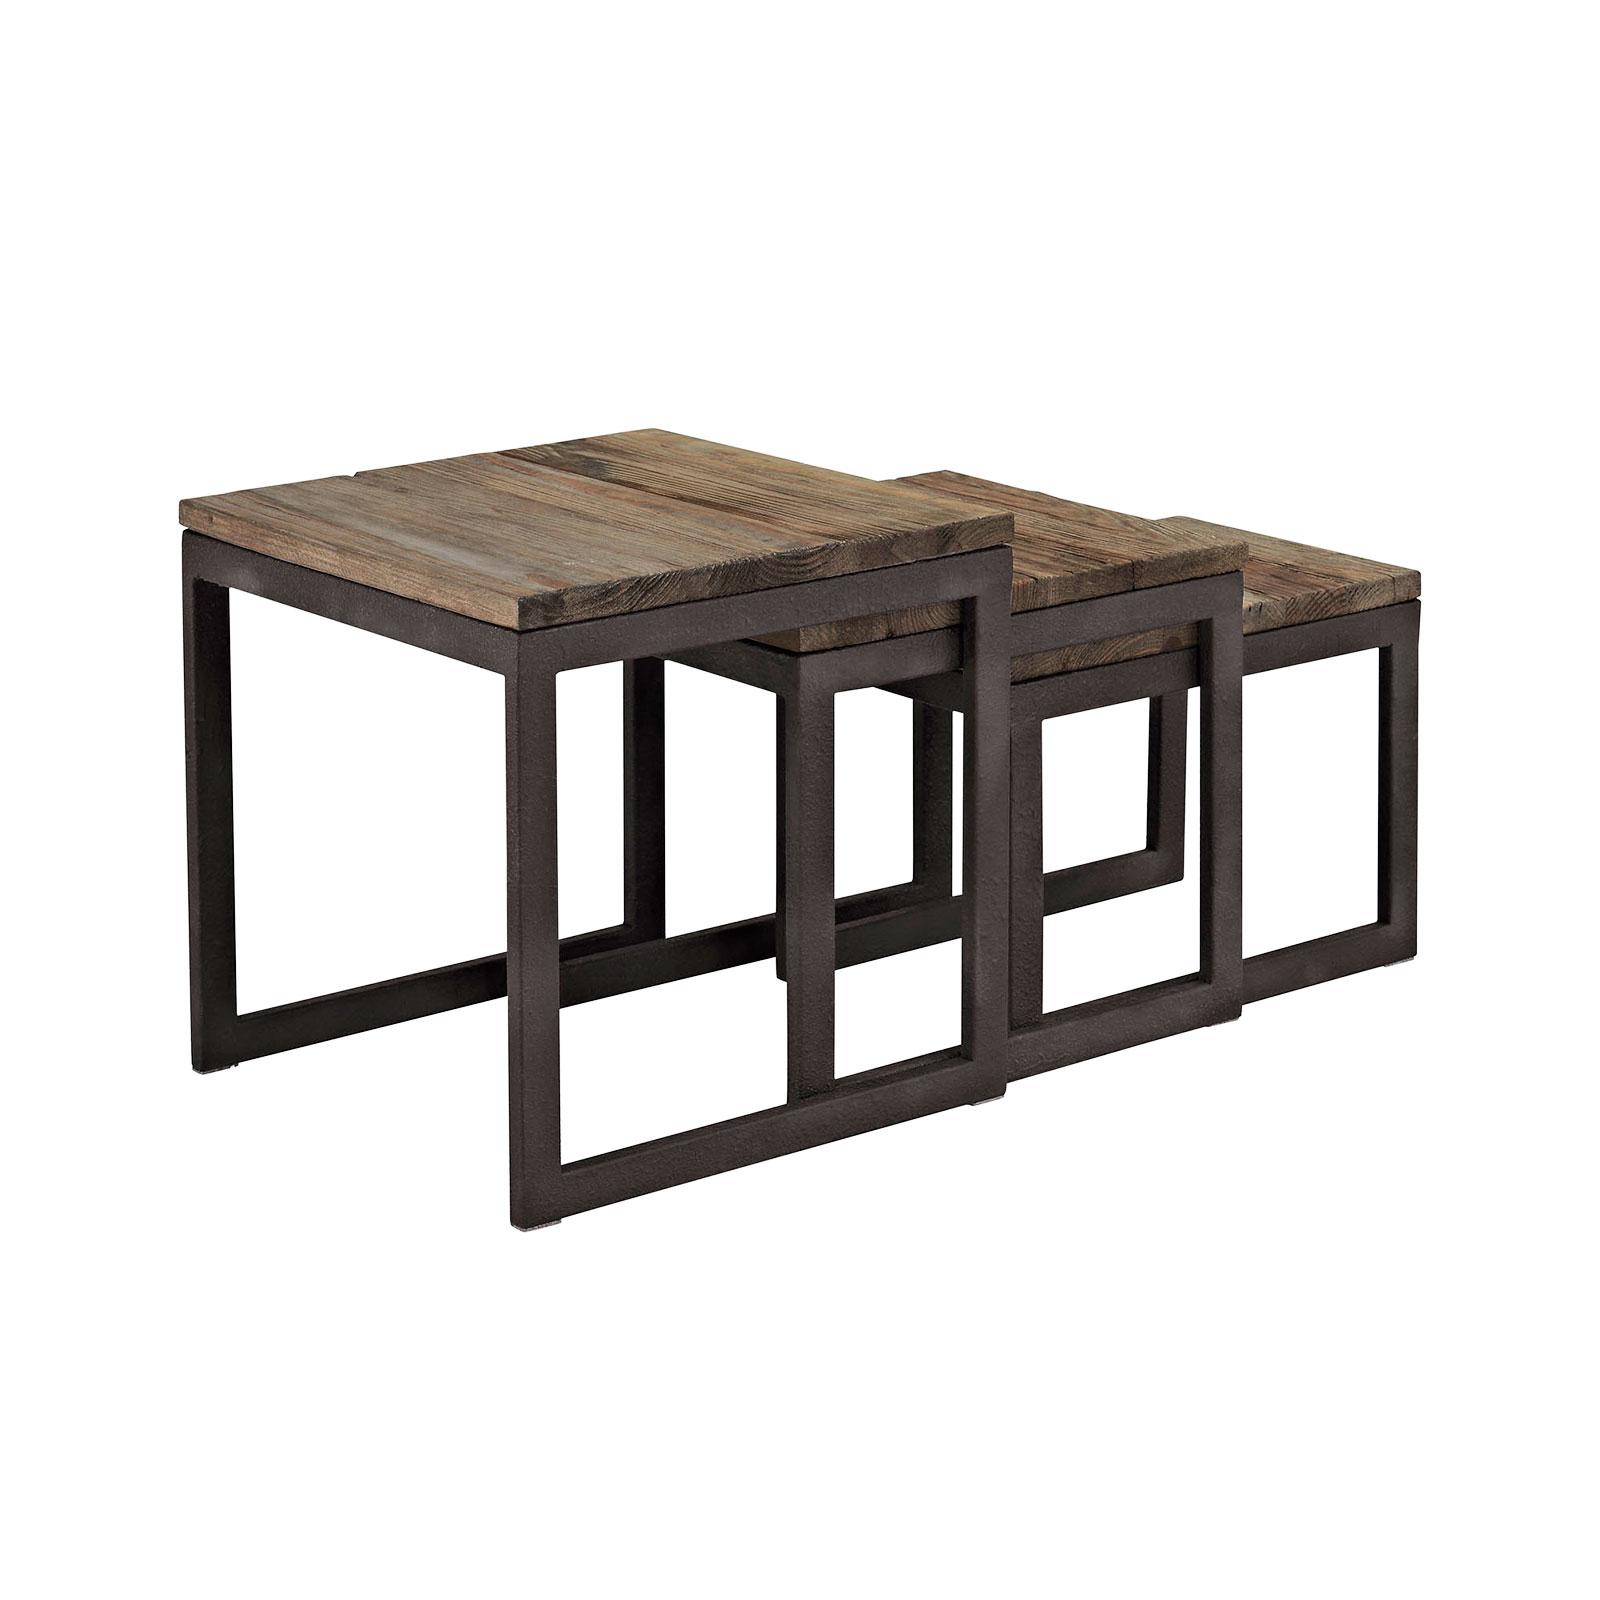 3Pc Studebaker Nesting Tables Harrys Used Furniture